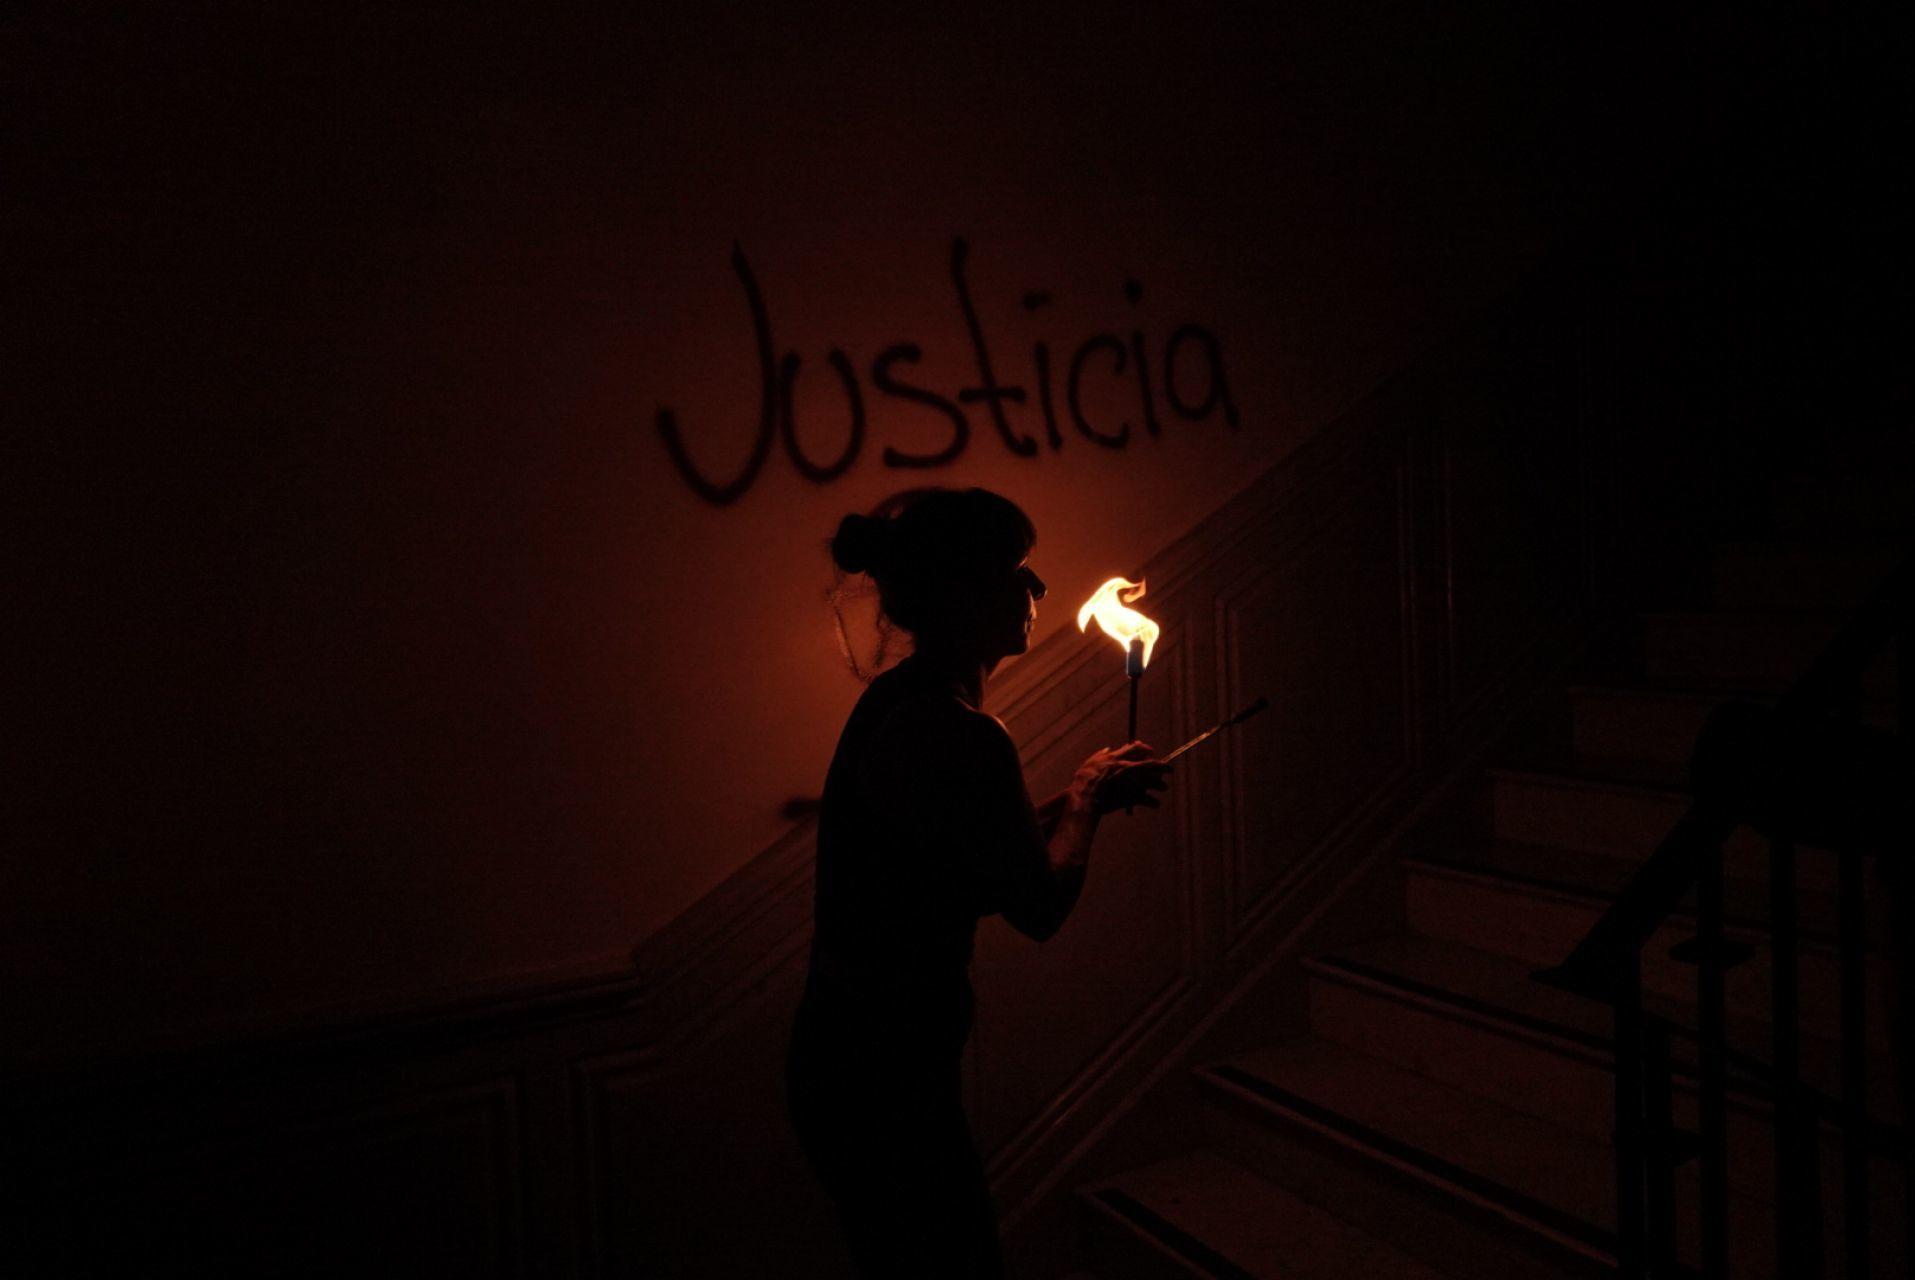 fotos-videos-imagenes-toma-feminista-cndh-oficinas-centro-cdmx-rosario-piedra-05